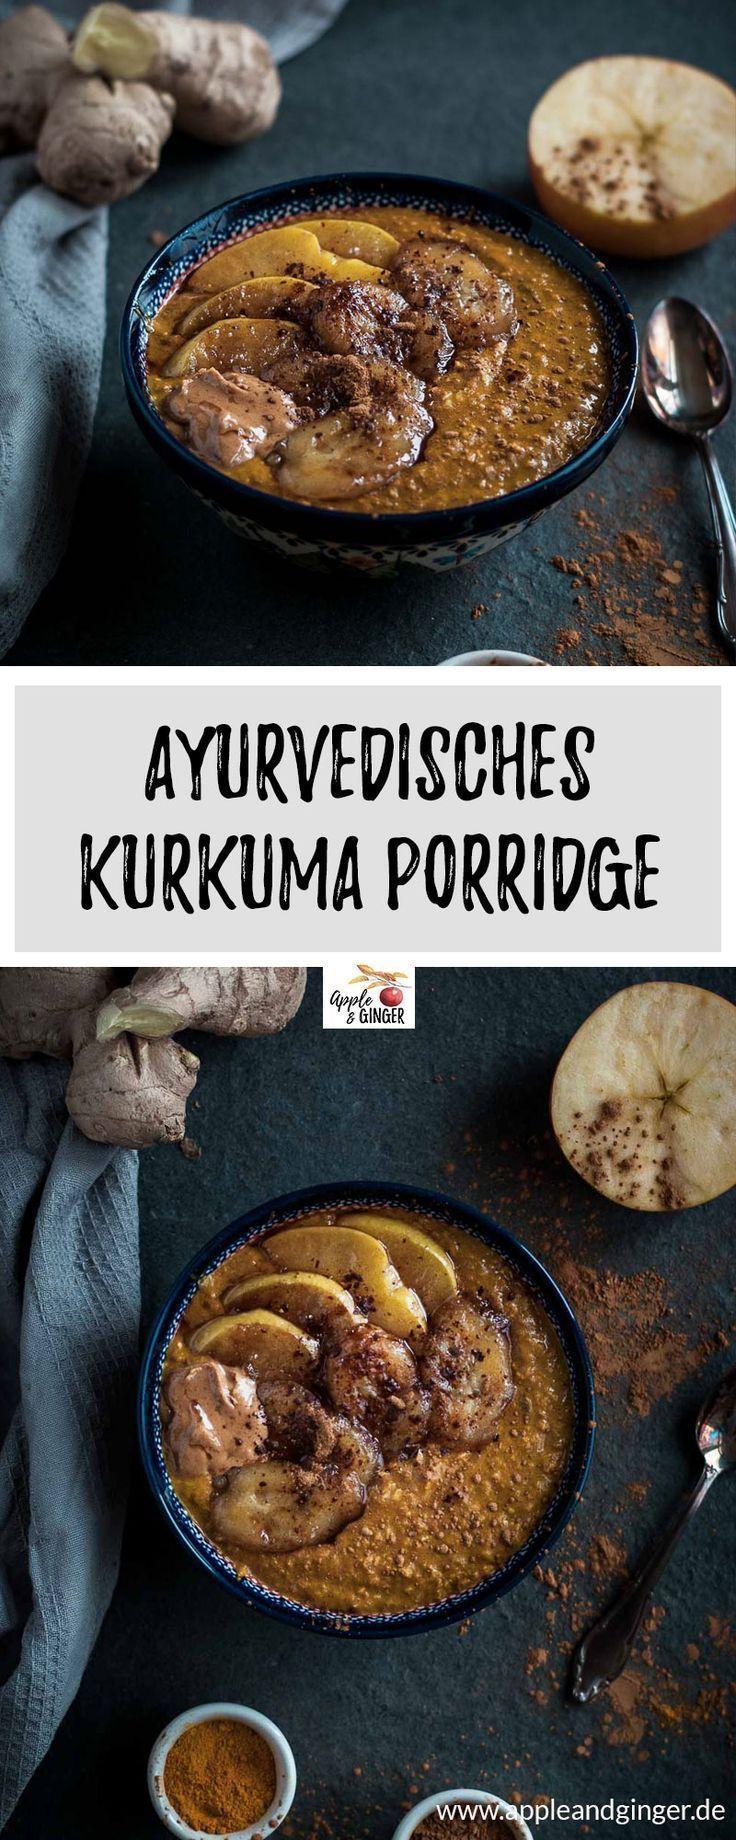 Ayurvedischer Kurkuma Porridge zum Frühstück- #Vegan #Laktosefrei #Vegetarisch #Zuckerfrei #ayurveda #porridge #oatmeal #frühstück- www.appleandginger.de #food breakfast vegetarian Ayurvedisches Frühstück: Porridge mit Kurkuma - Apple and Ginger